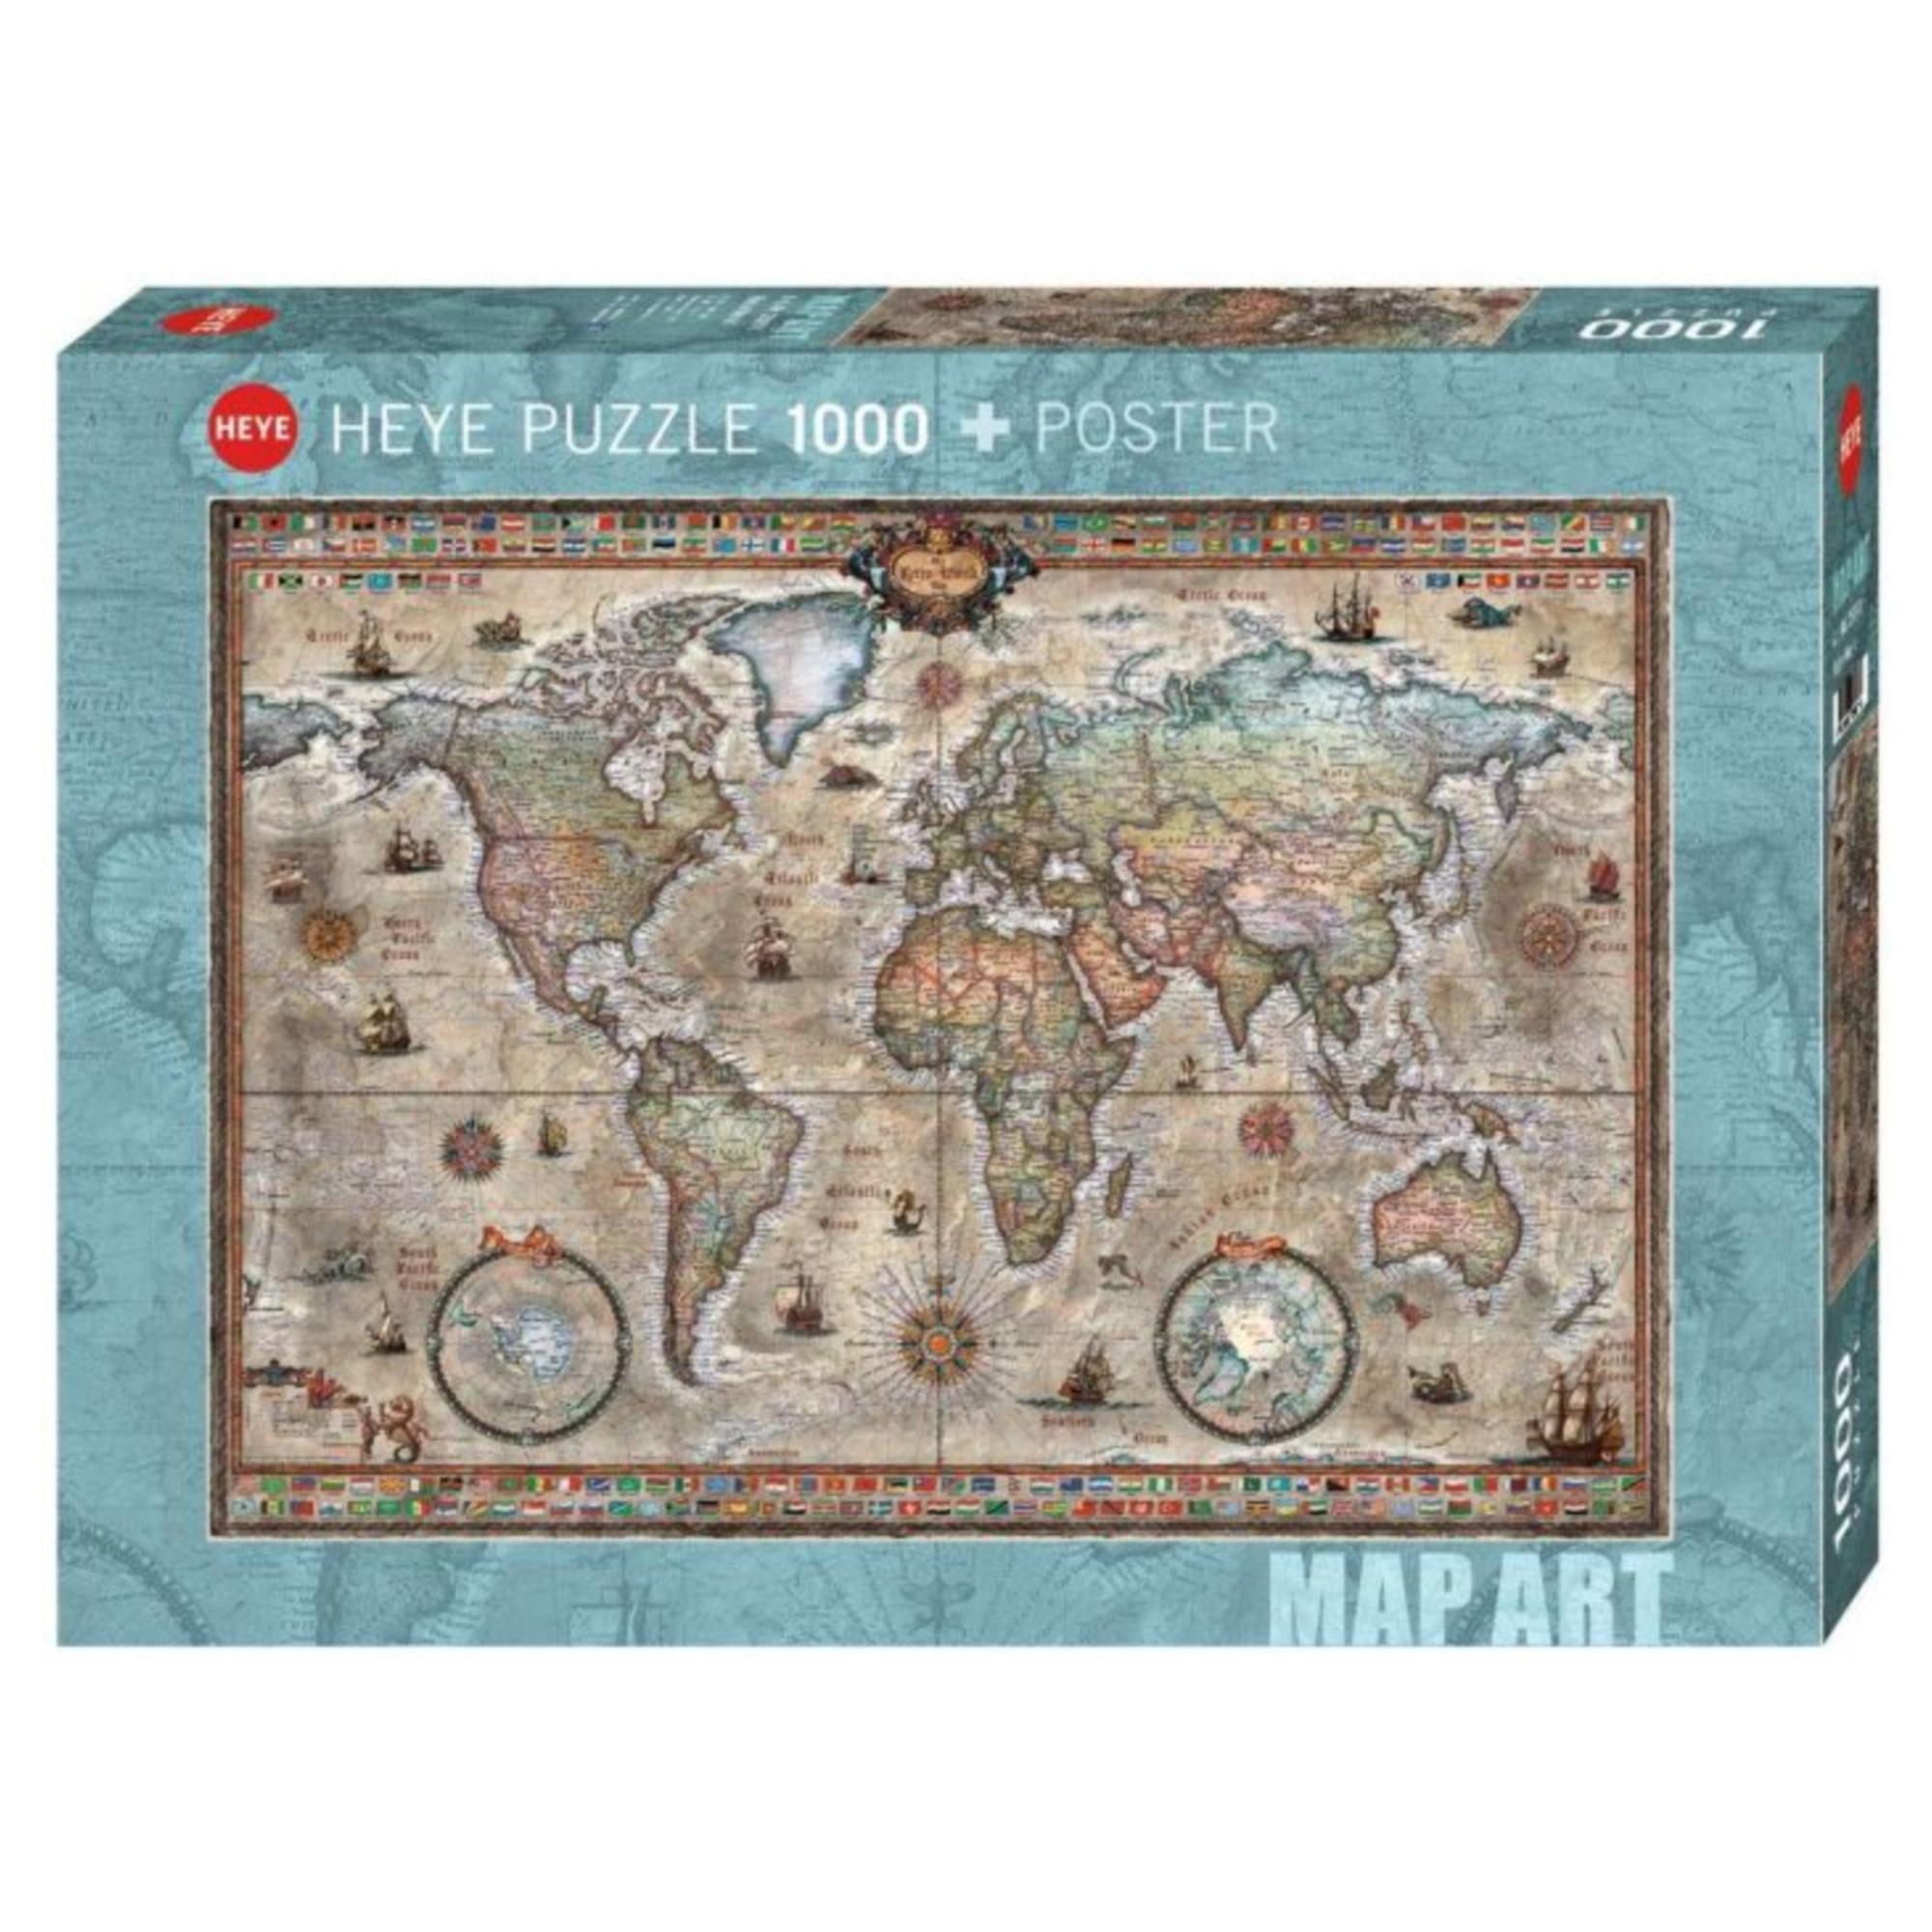 Heye Puzzle 1000: Retro World